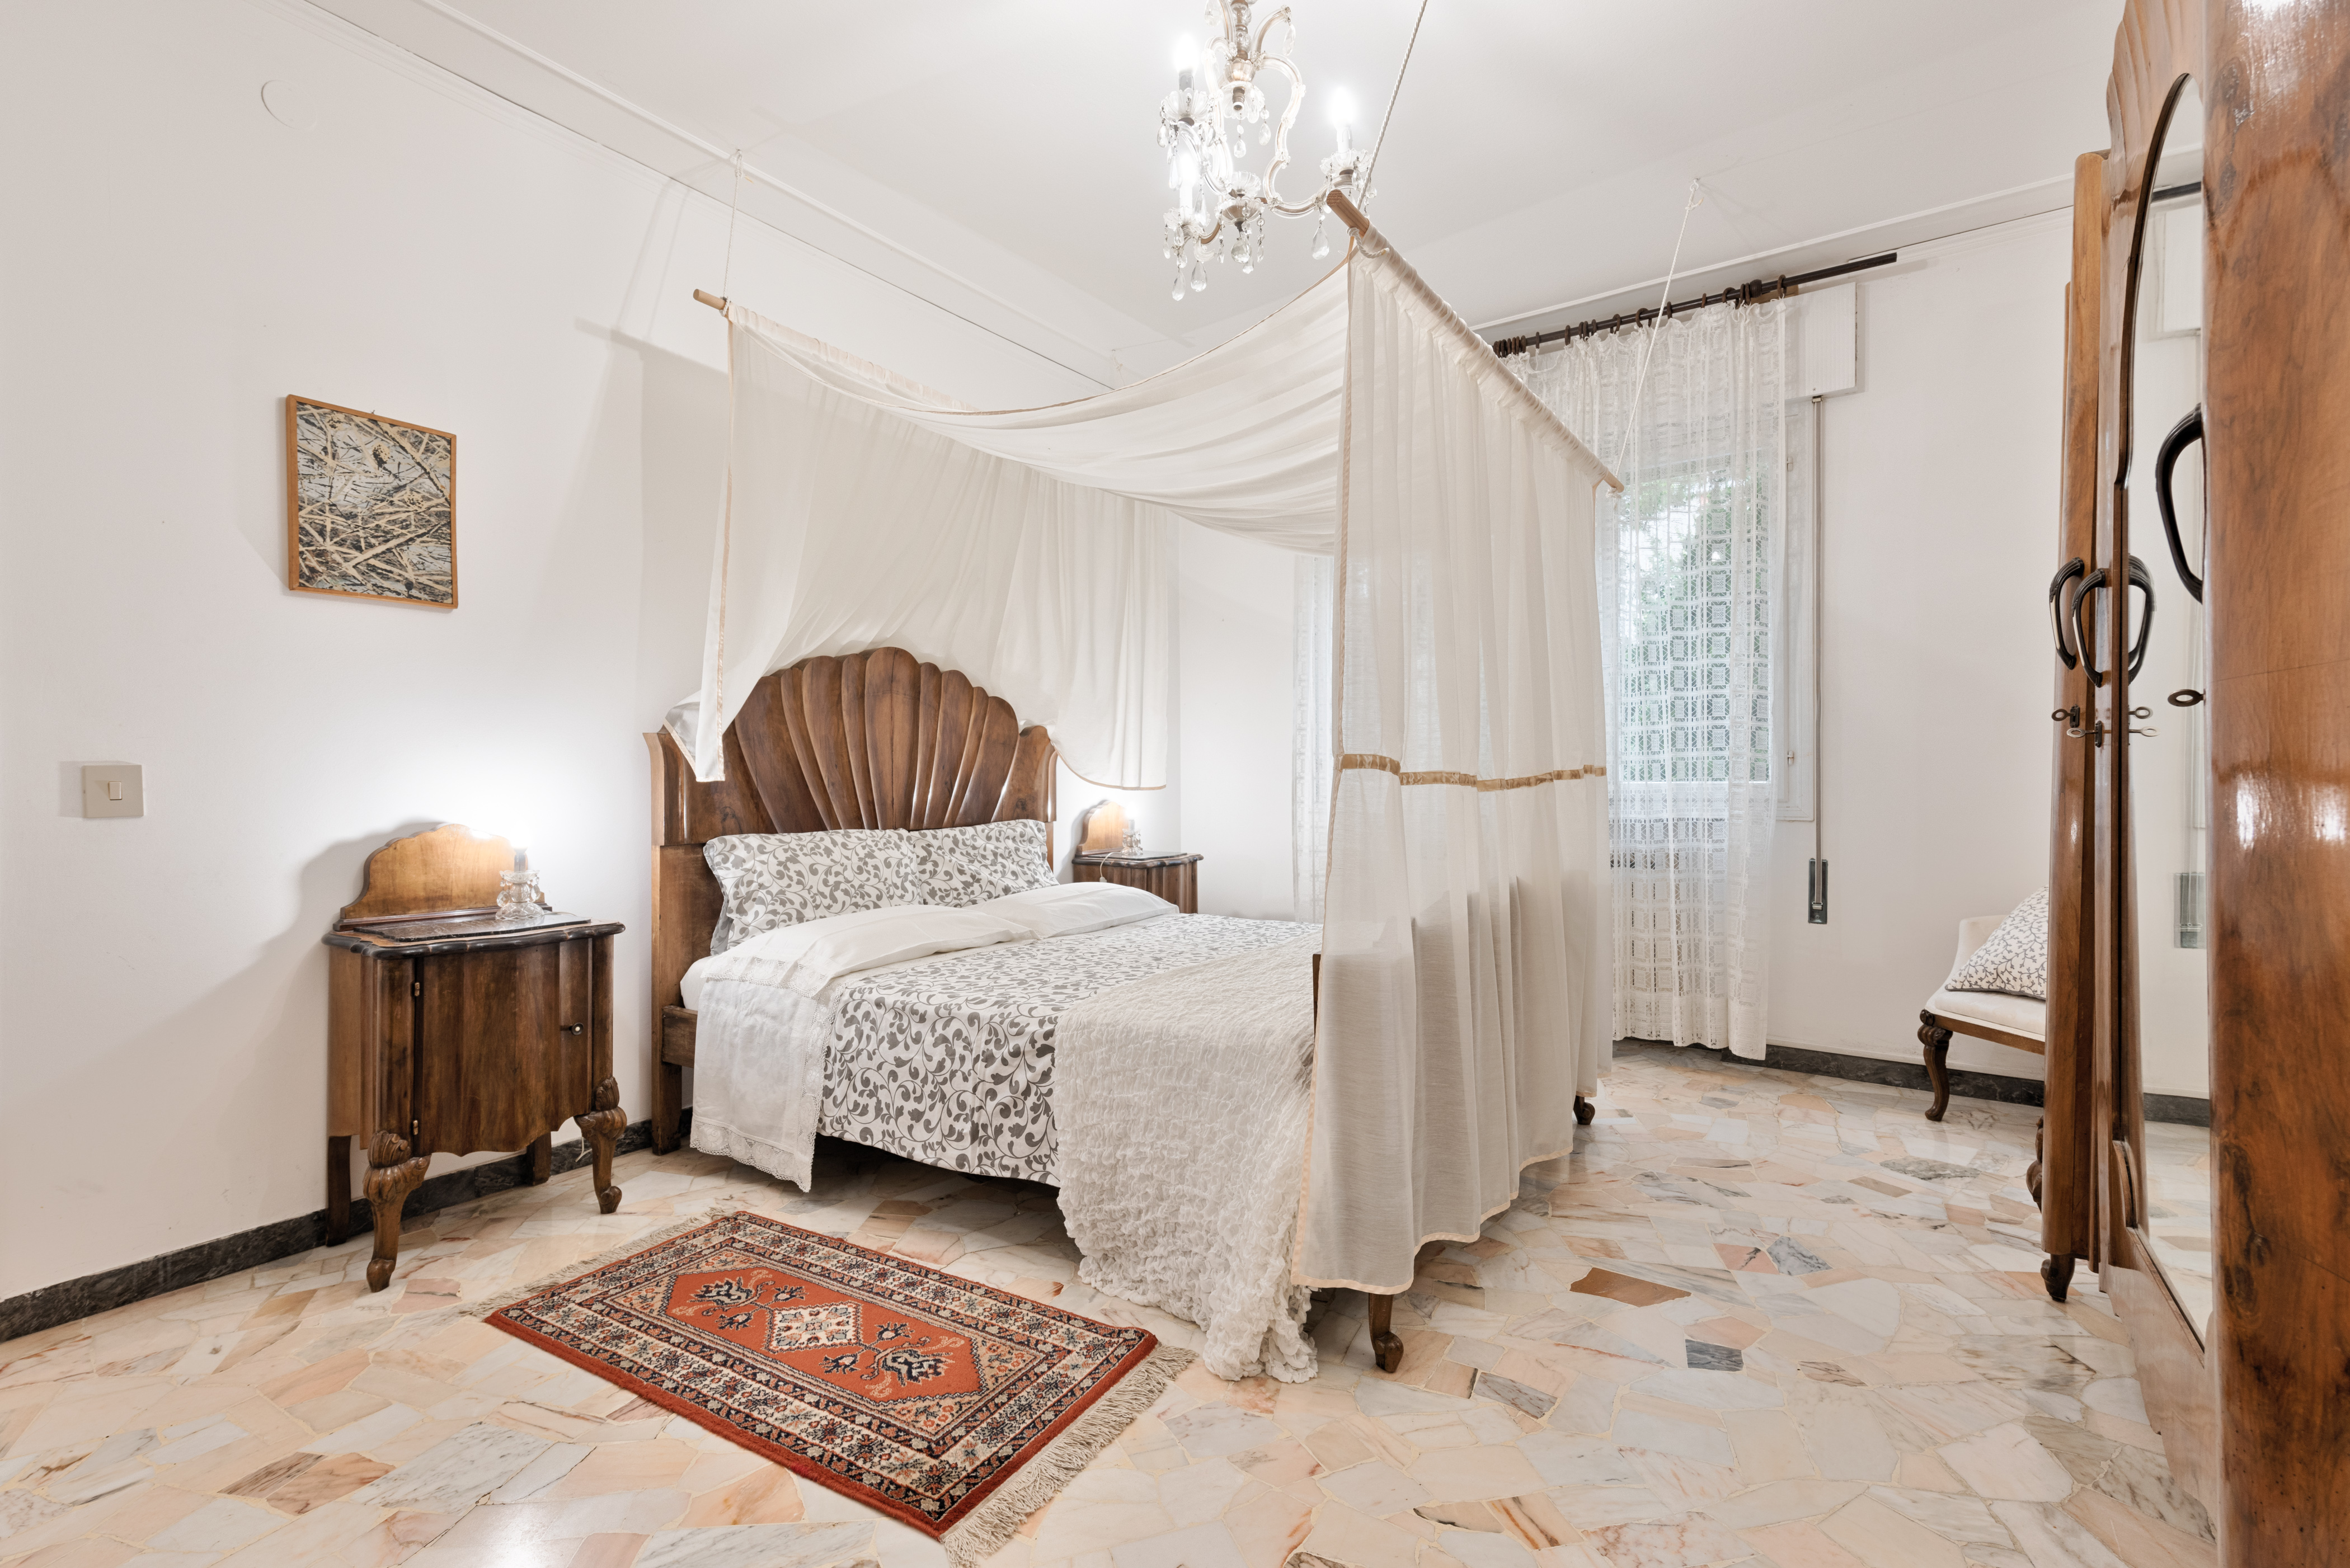 Negozi Biancheria Casa Mestre casa flora - apartments for rent in venice, veneto, italy